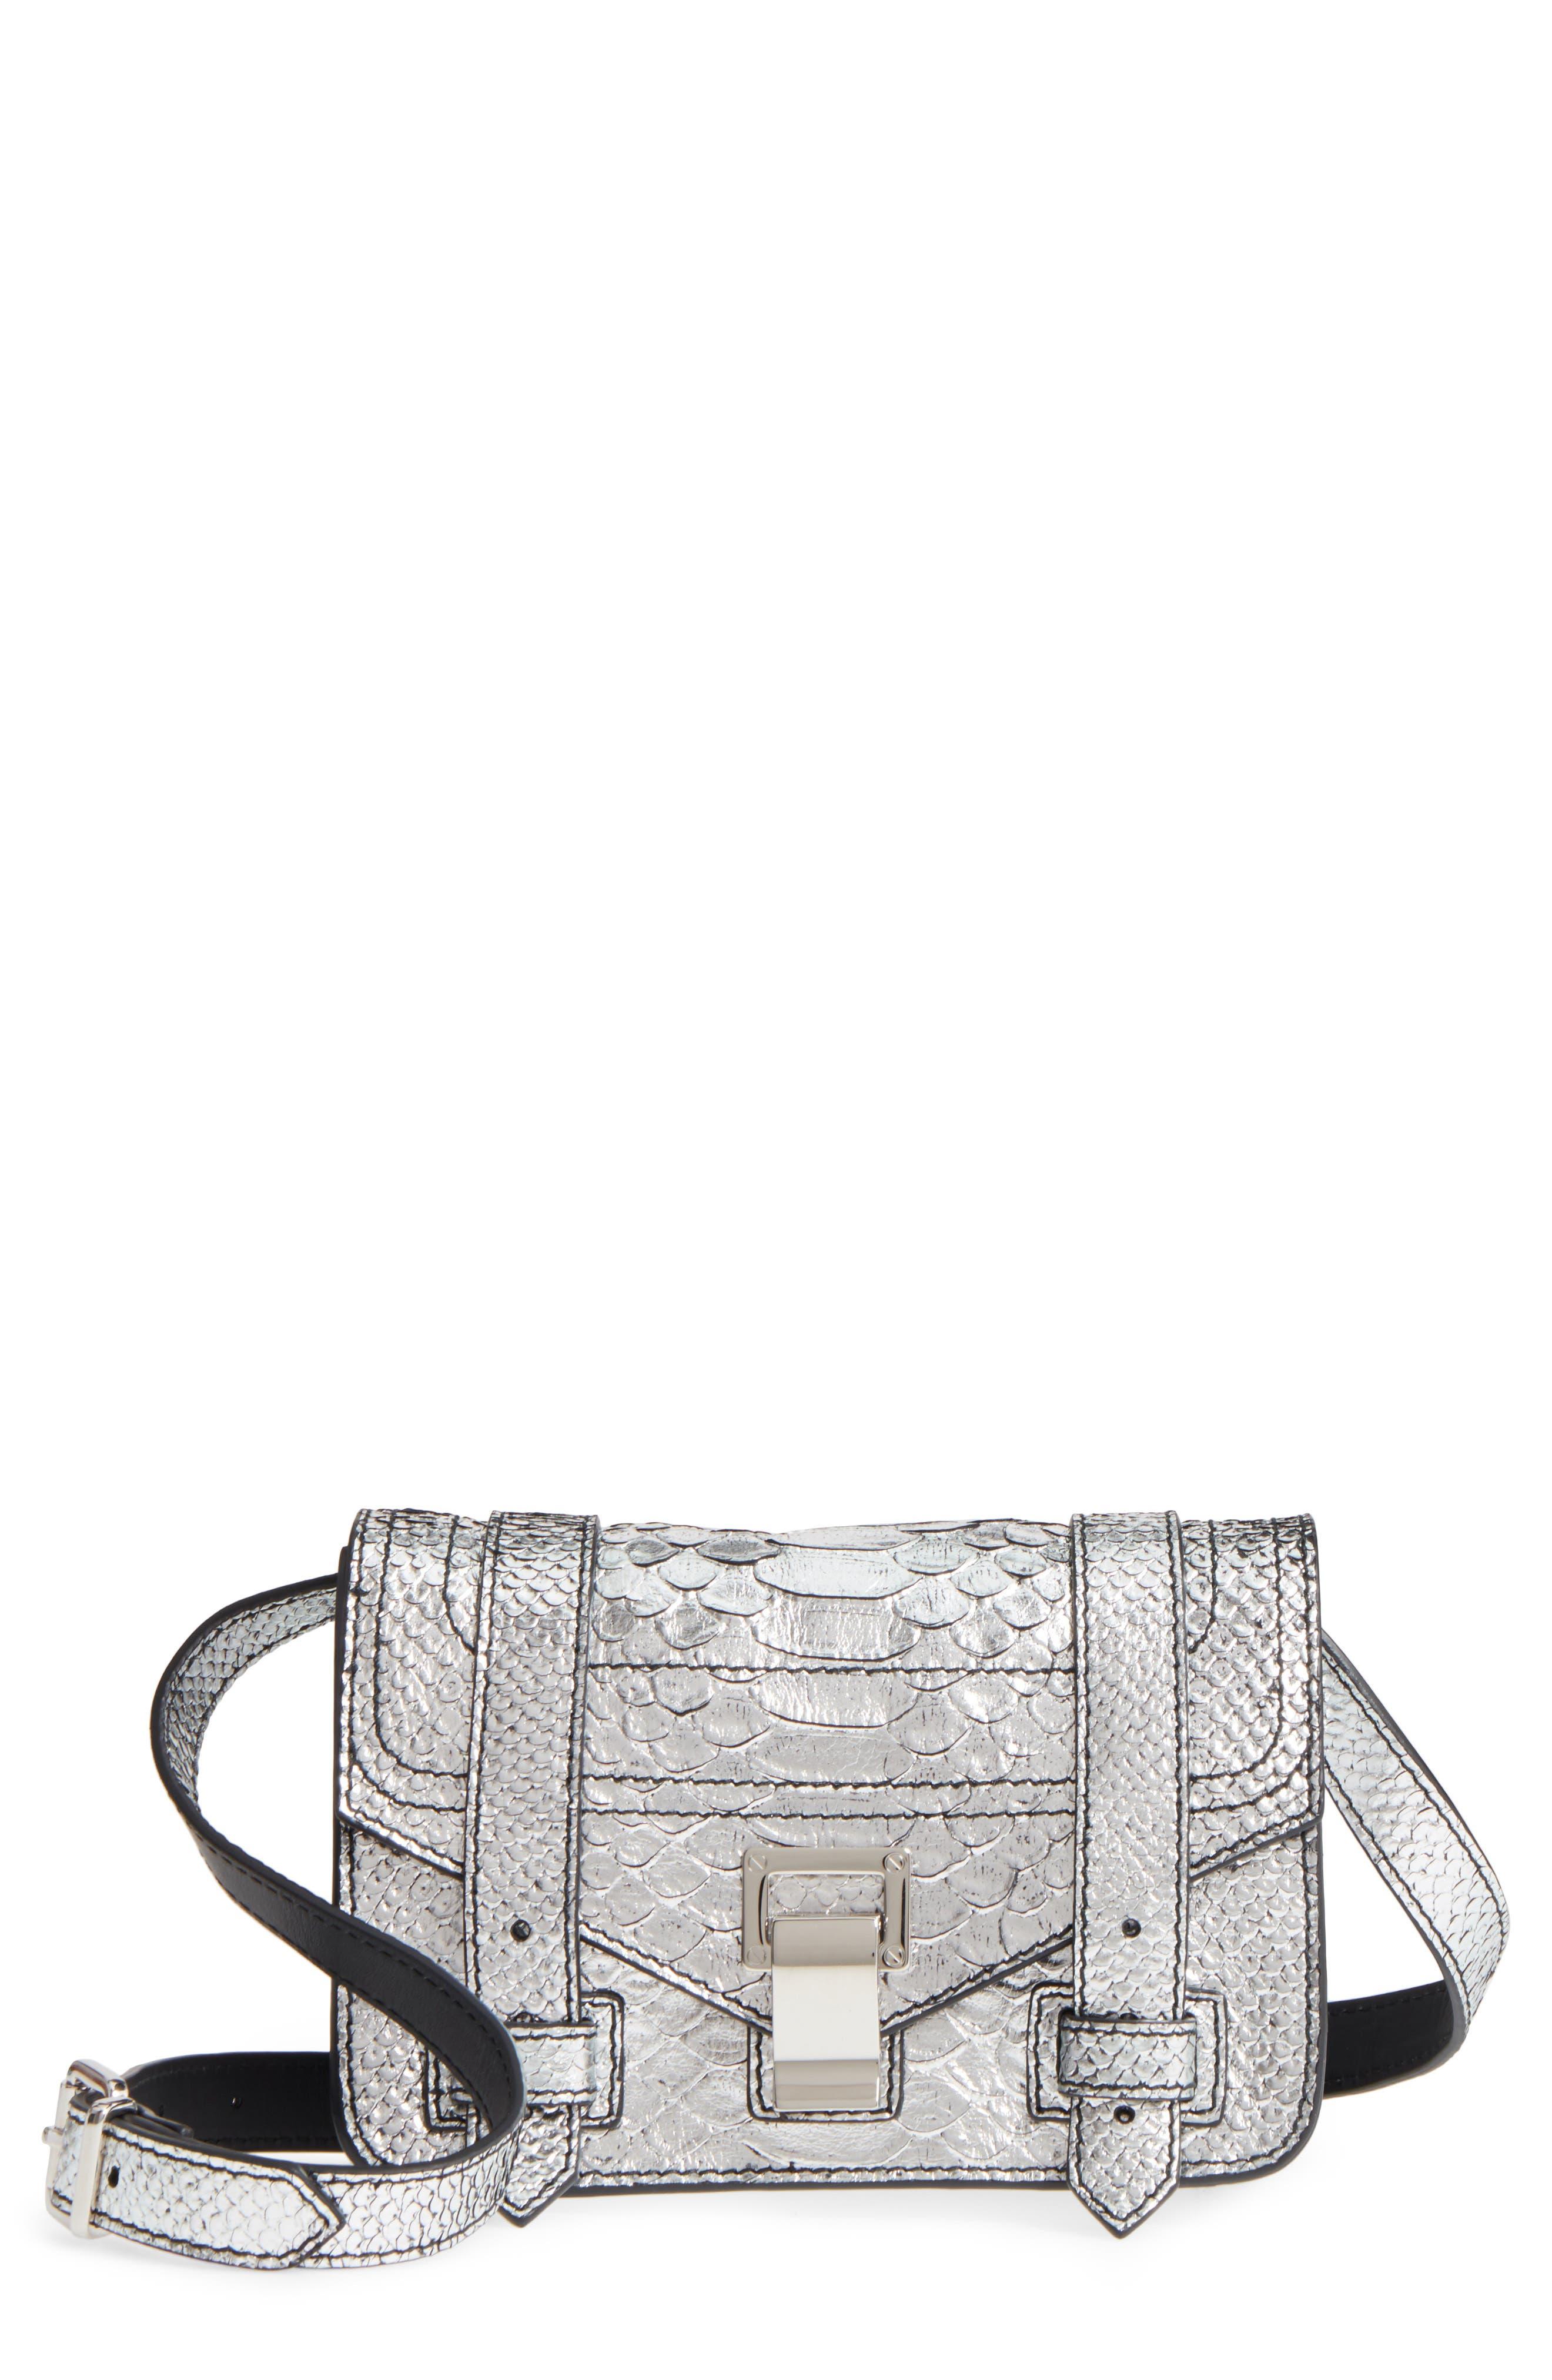 Main Image - Proenza Schouler Mini PS1 Snakeskin Embossed Metallic Leather Crossbody Bag